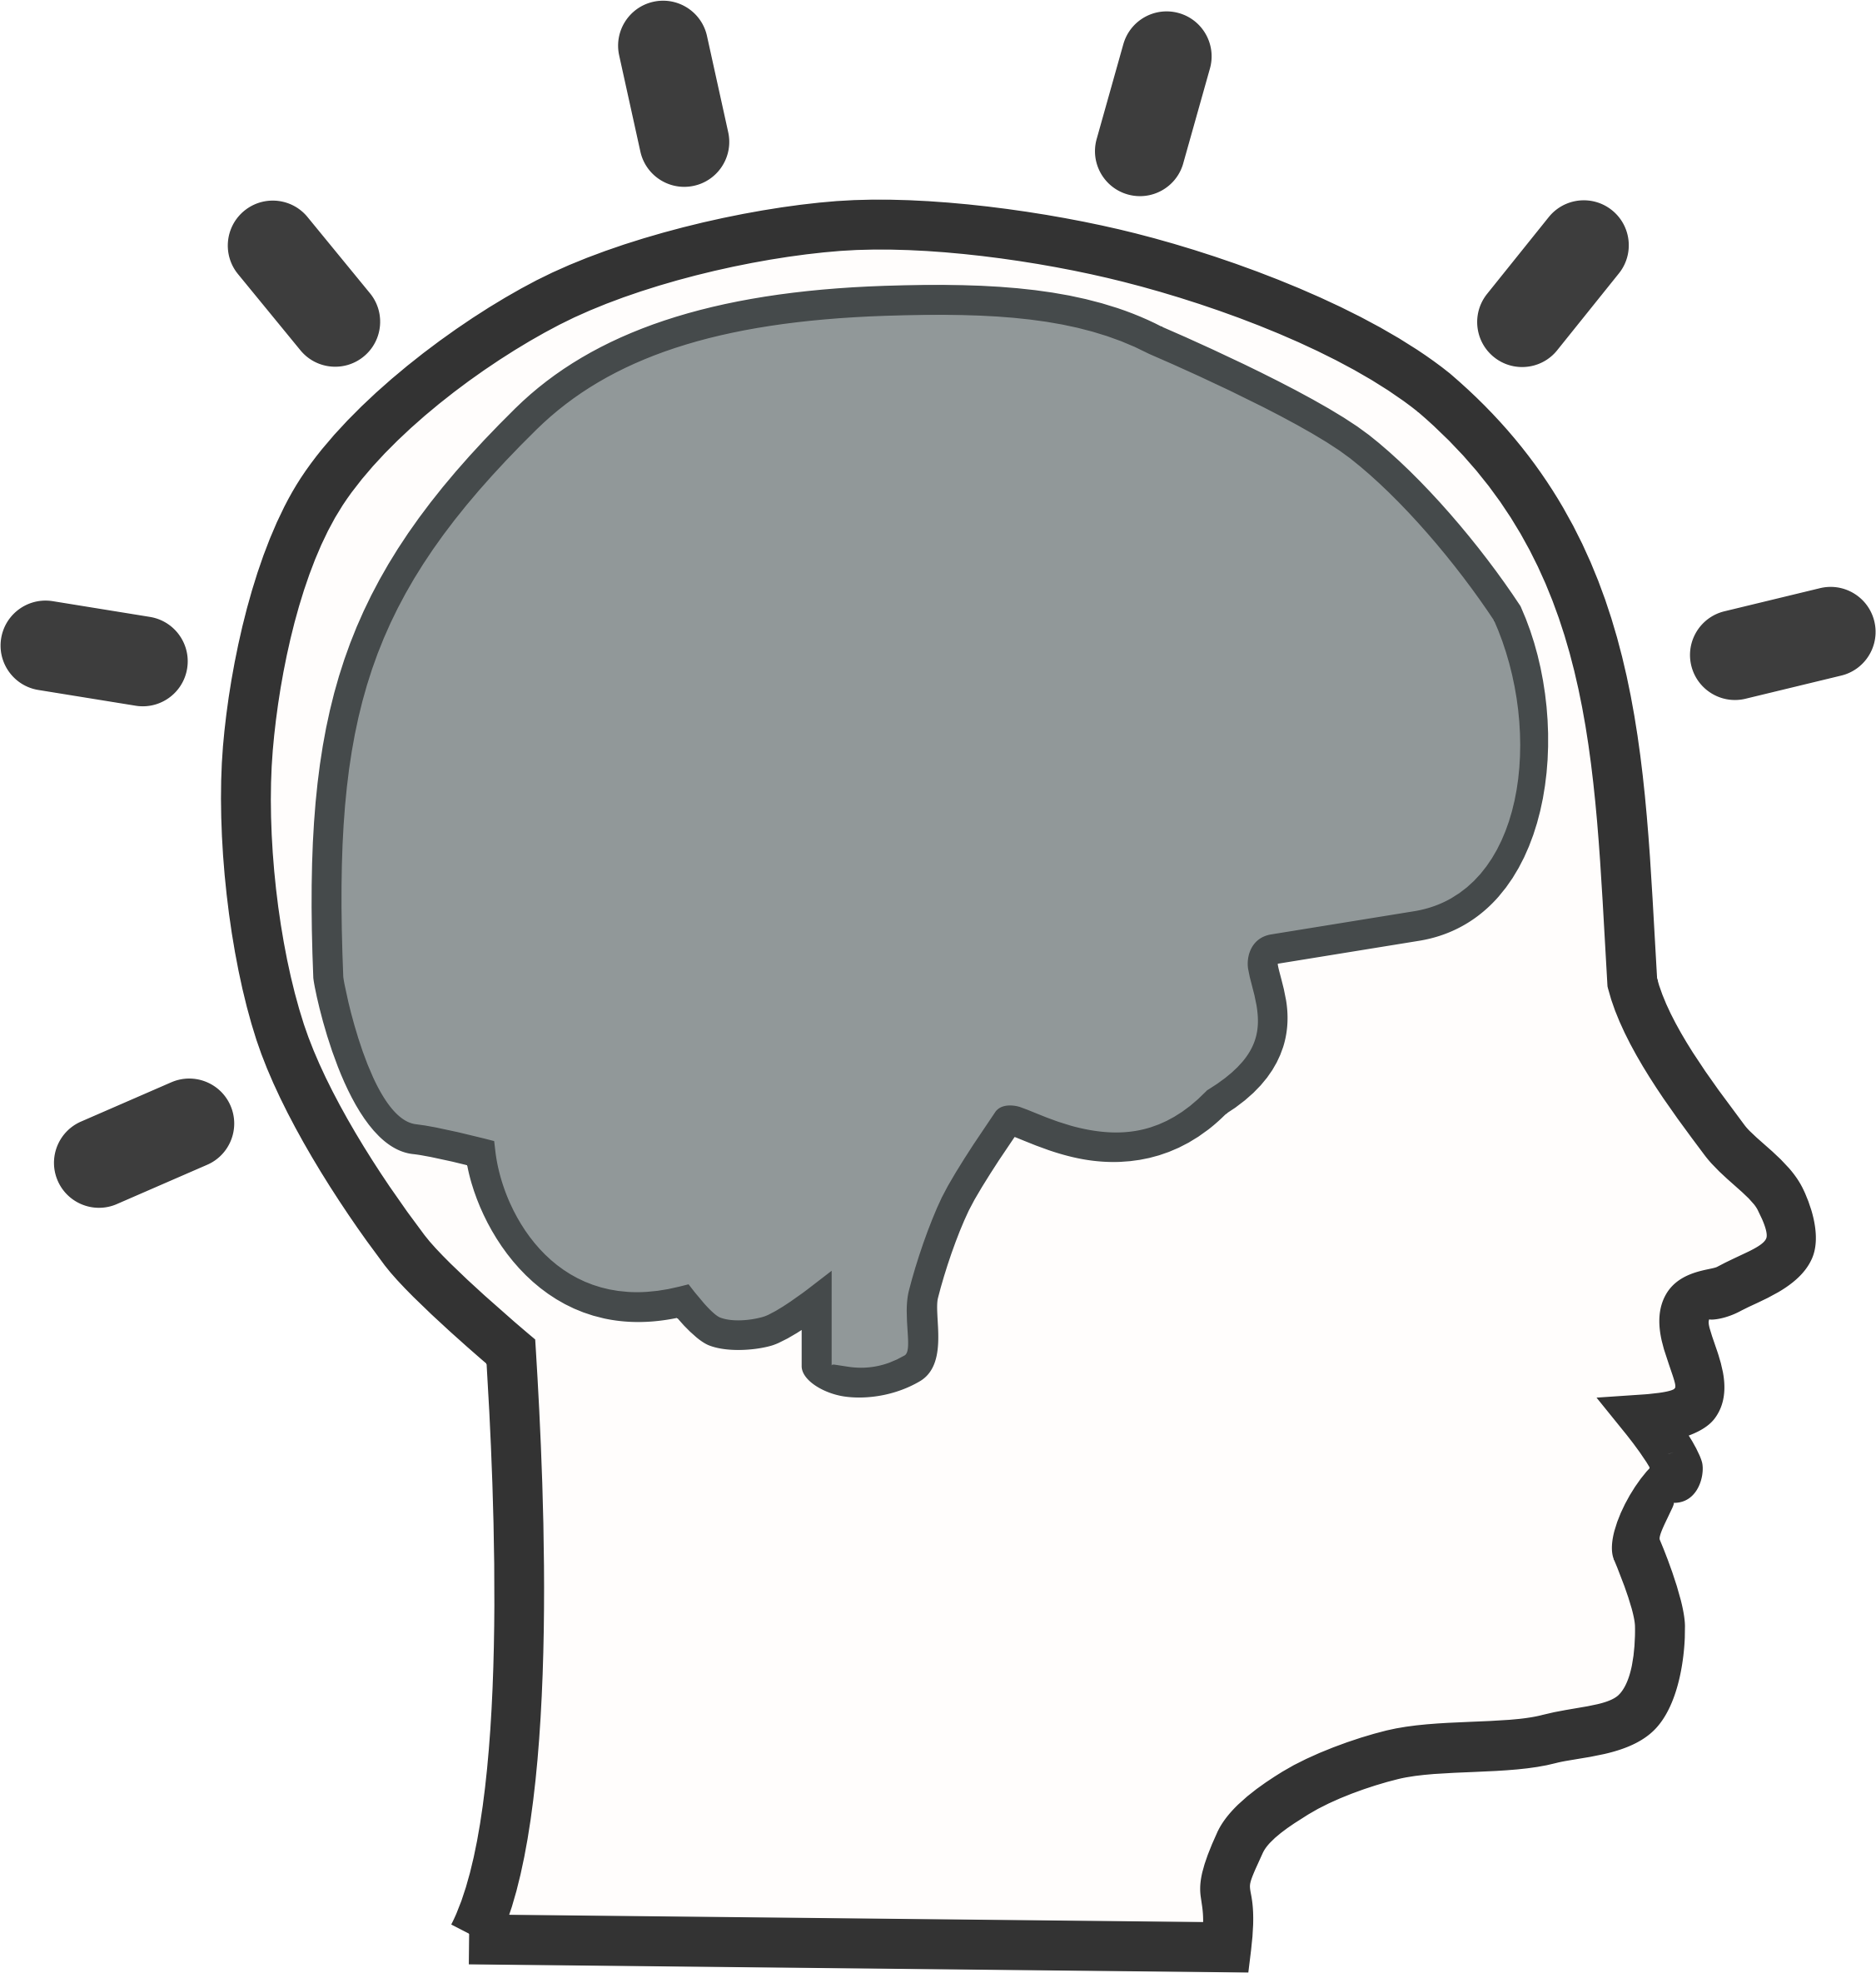 Free Brain Cliparts Transparent, Download Free Clip Art.